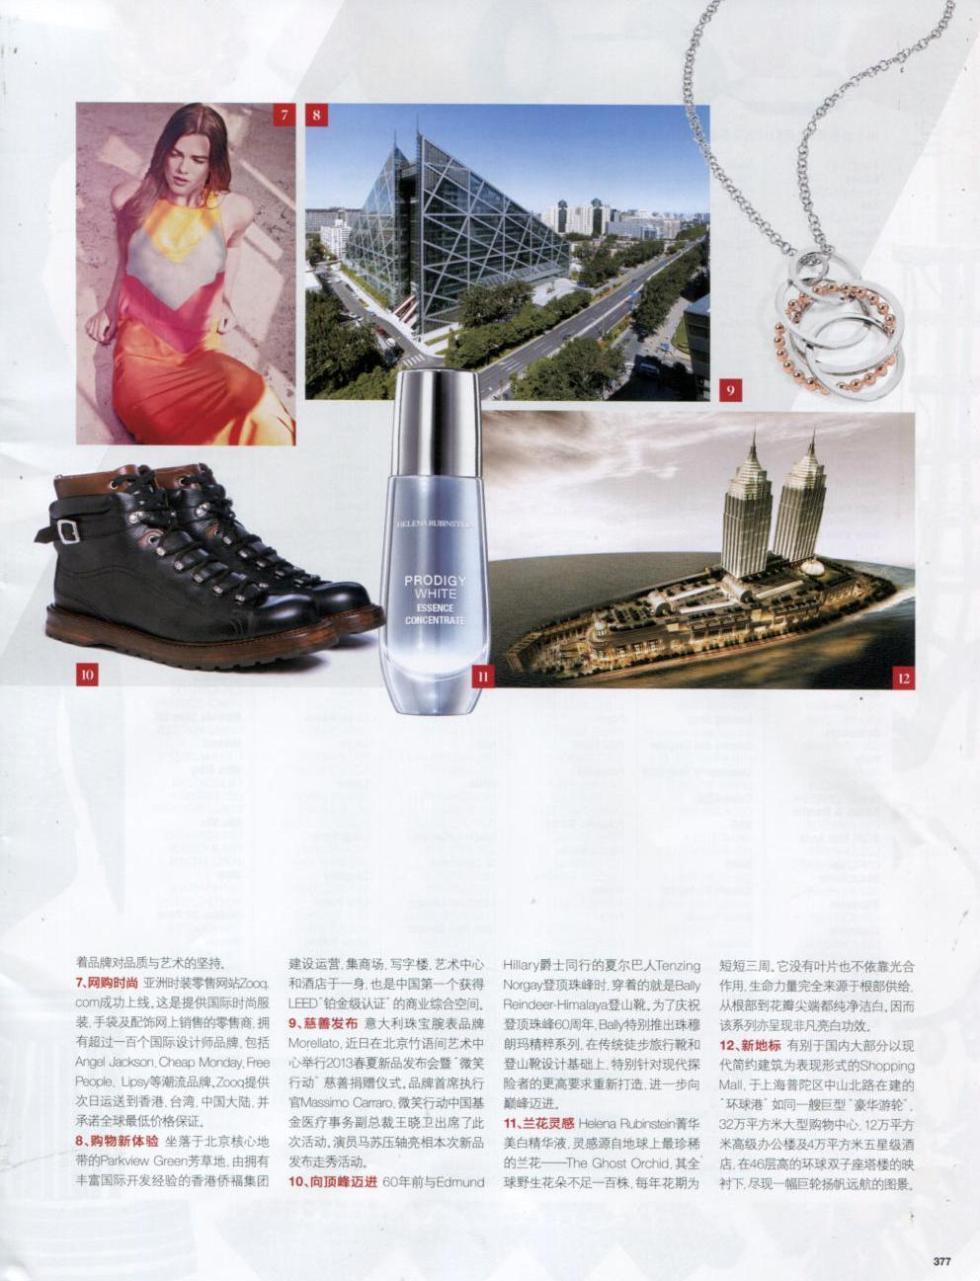 Vogue CHI 2013-6-1 pag 377